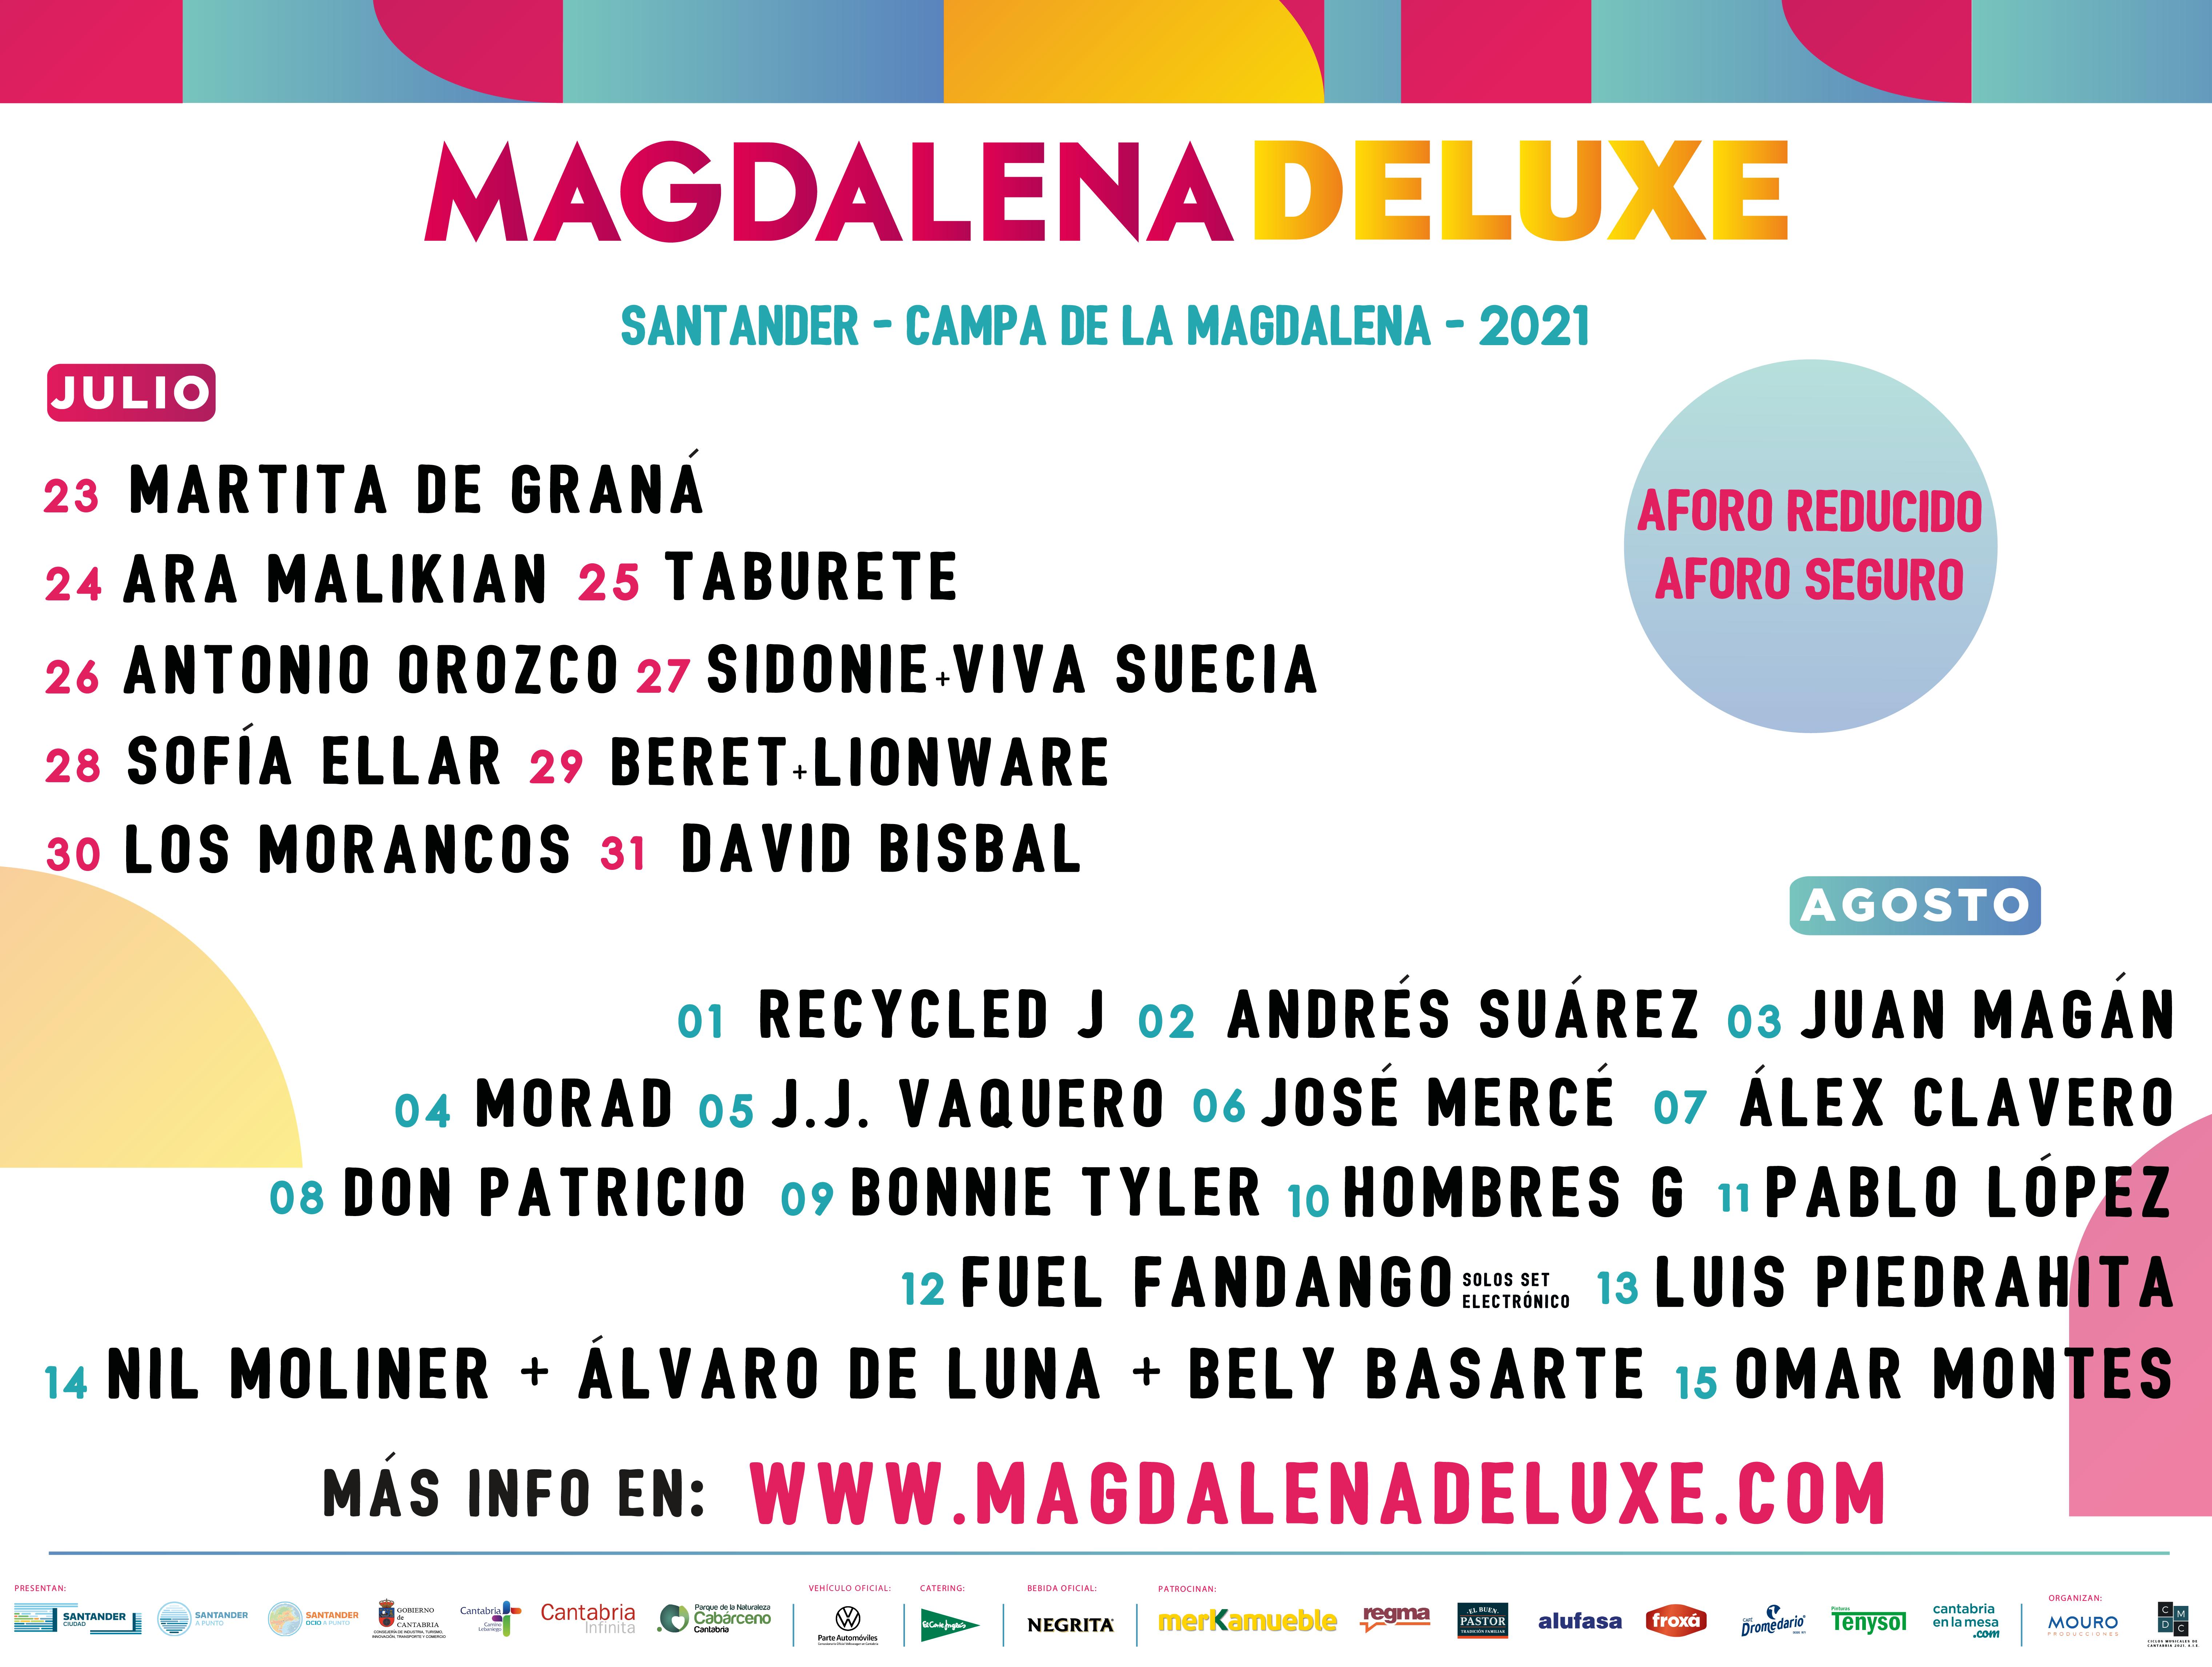 sidonie-viva-suecia-magdalena-deluxe-27-julio-60d9a94387bc30.19951622.png